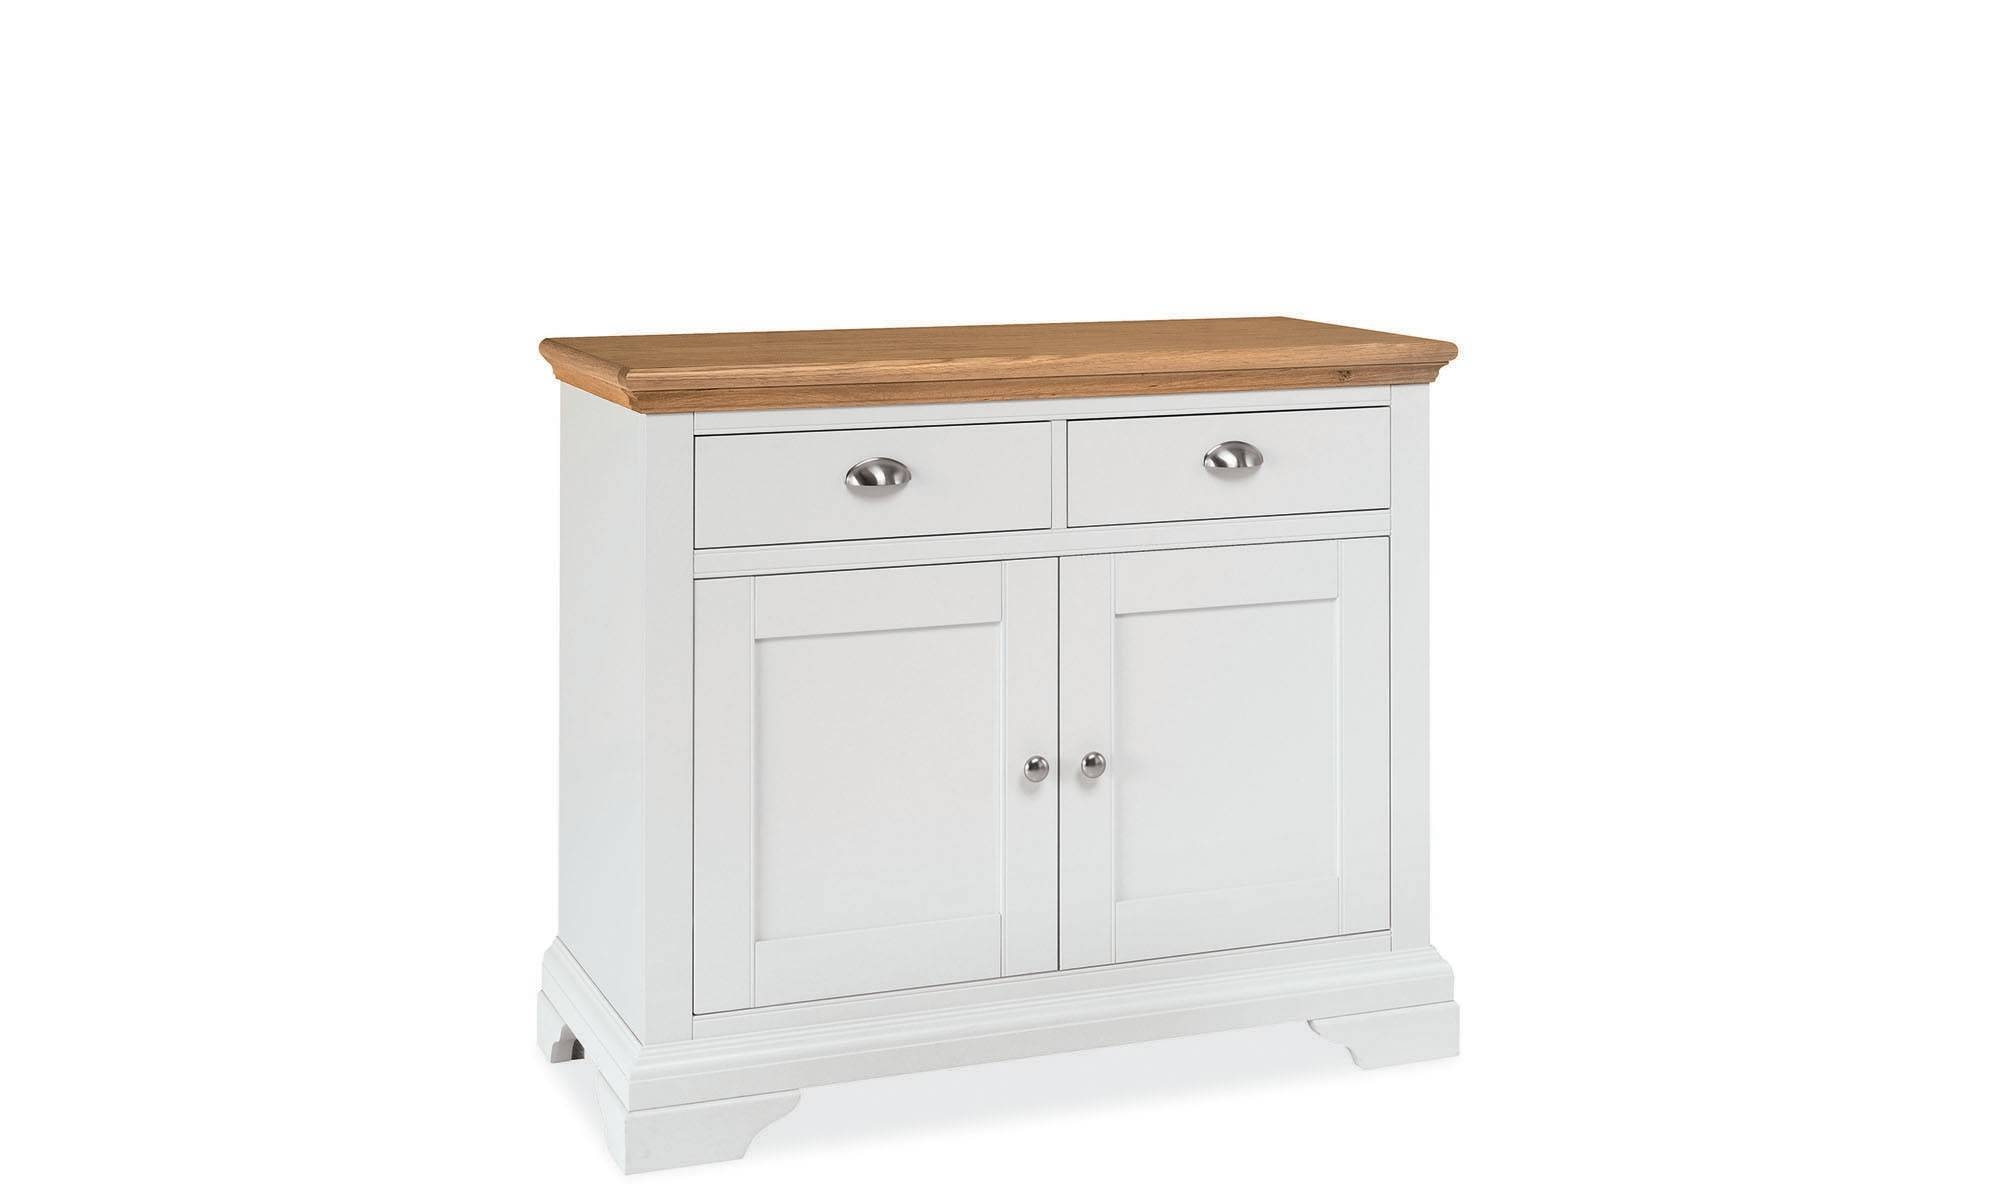 Georgie – Narrow 2 Door Sideboard Cream Painted / Natural Oak Top Regarding Cream Sideboard (#15 of 20)